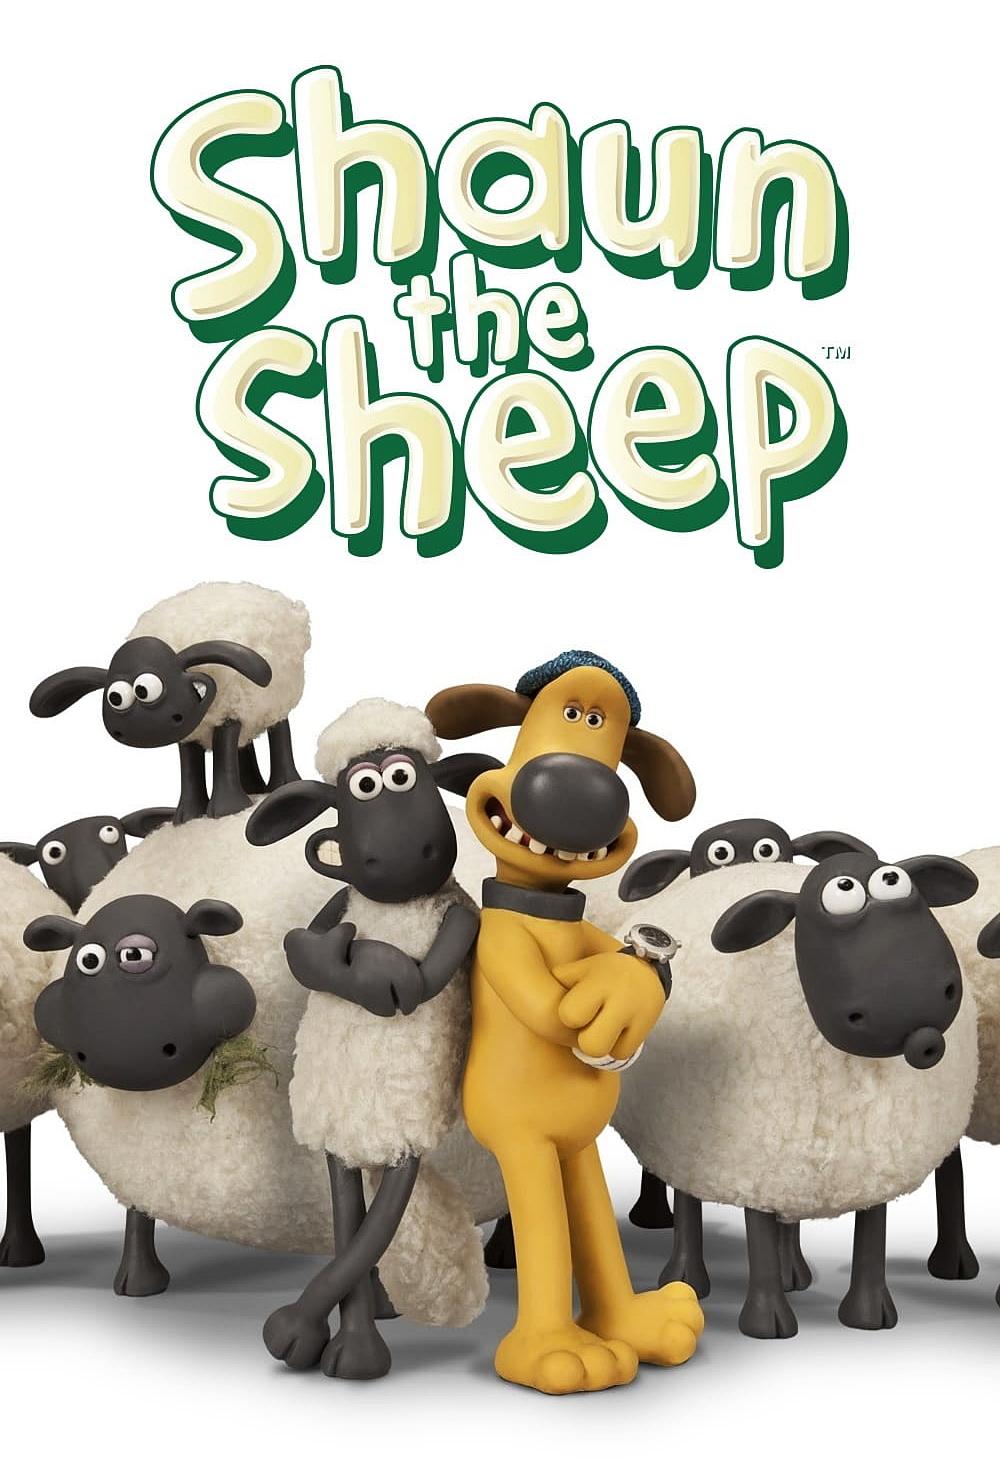 shaun the sheep movie free download in hindi